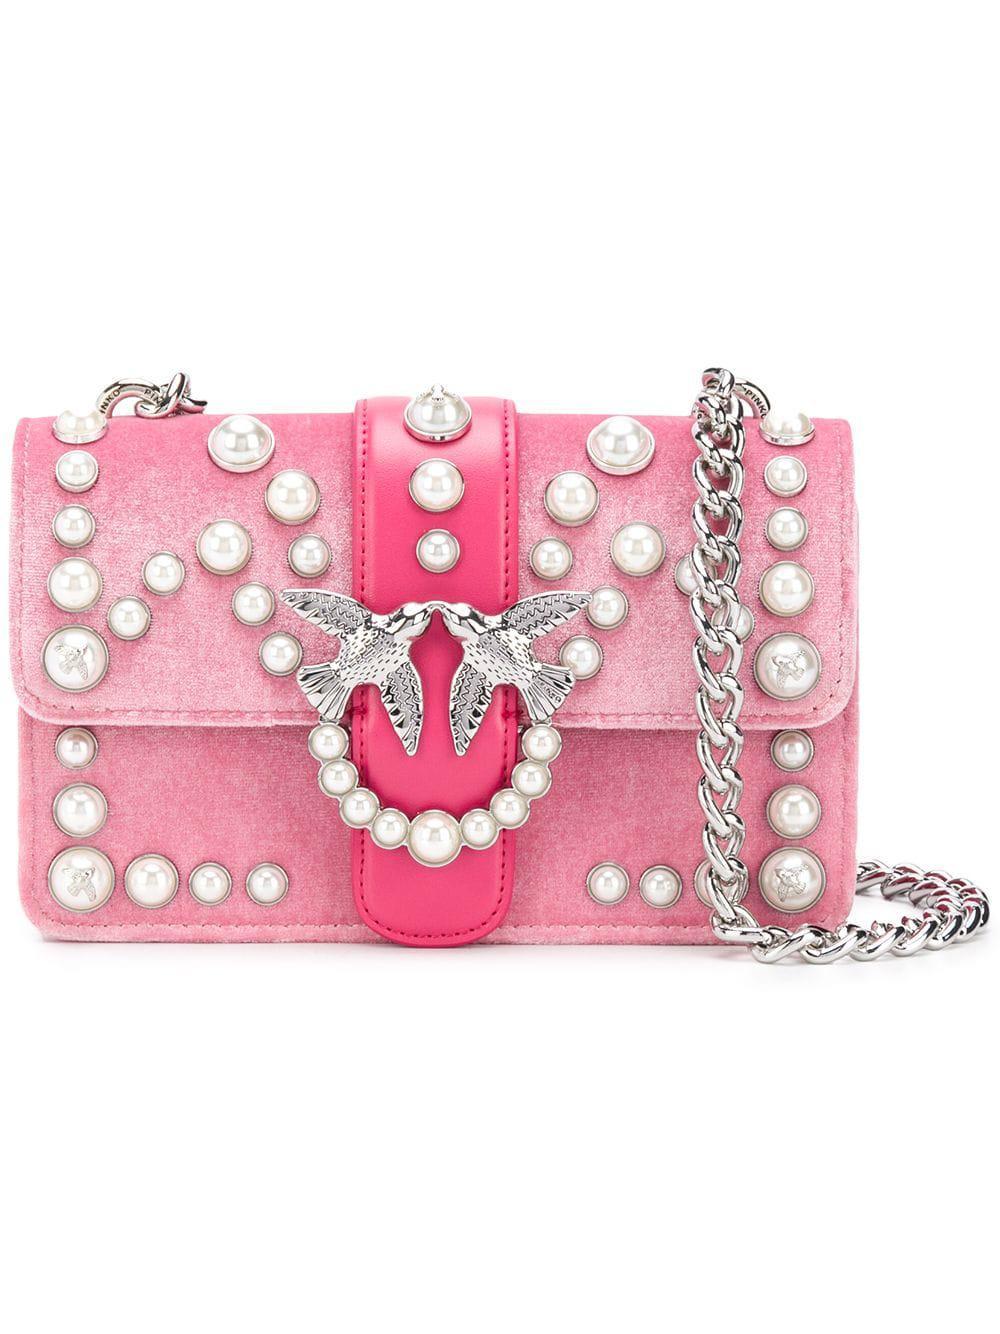 Pinko Pearl Embellished Crossbody Bag